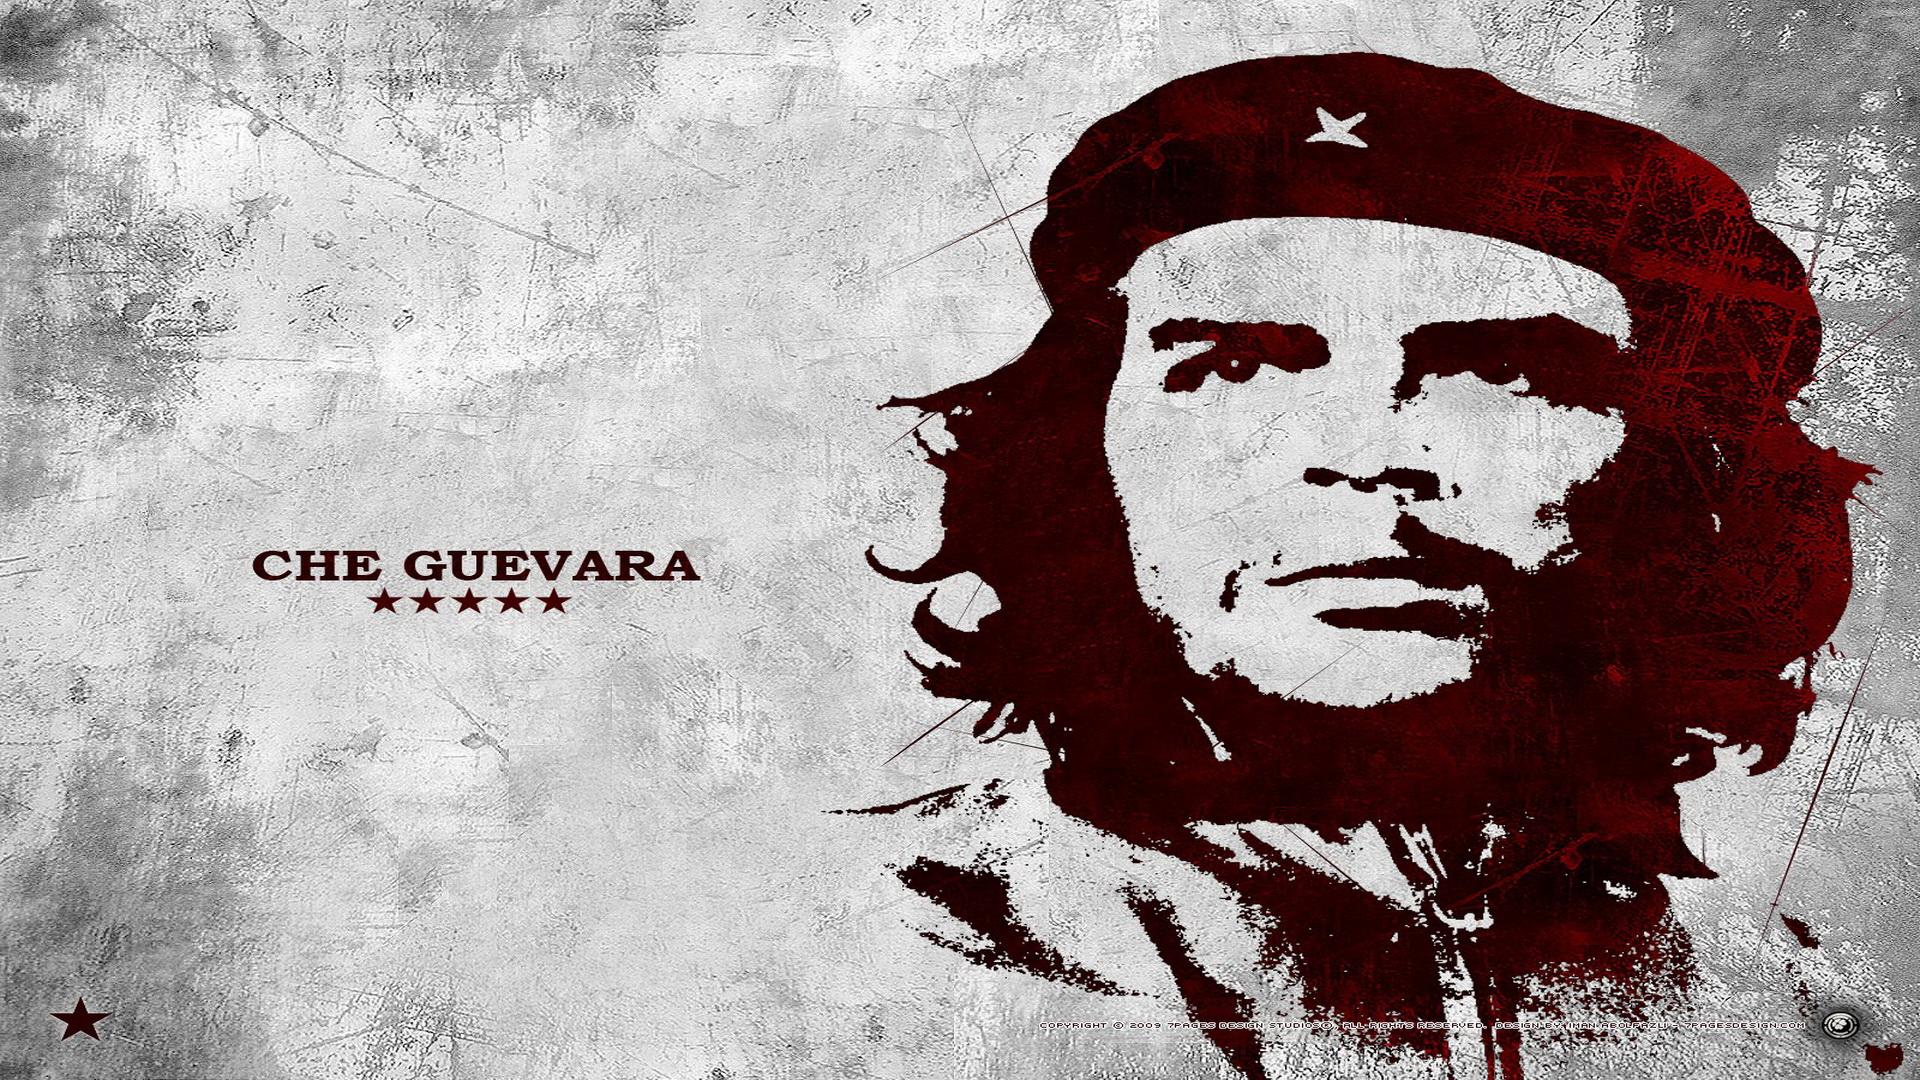 Che Guevara Wallpapers 1920x1080